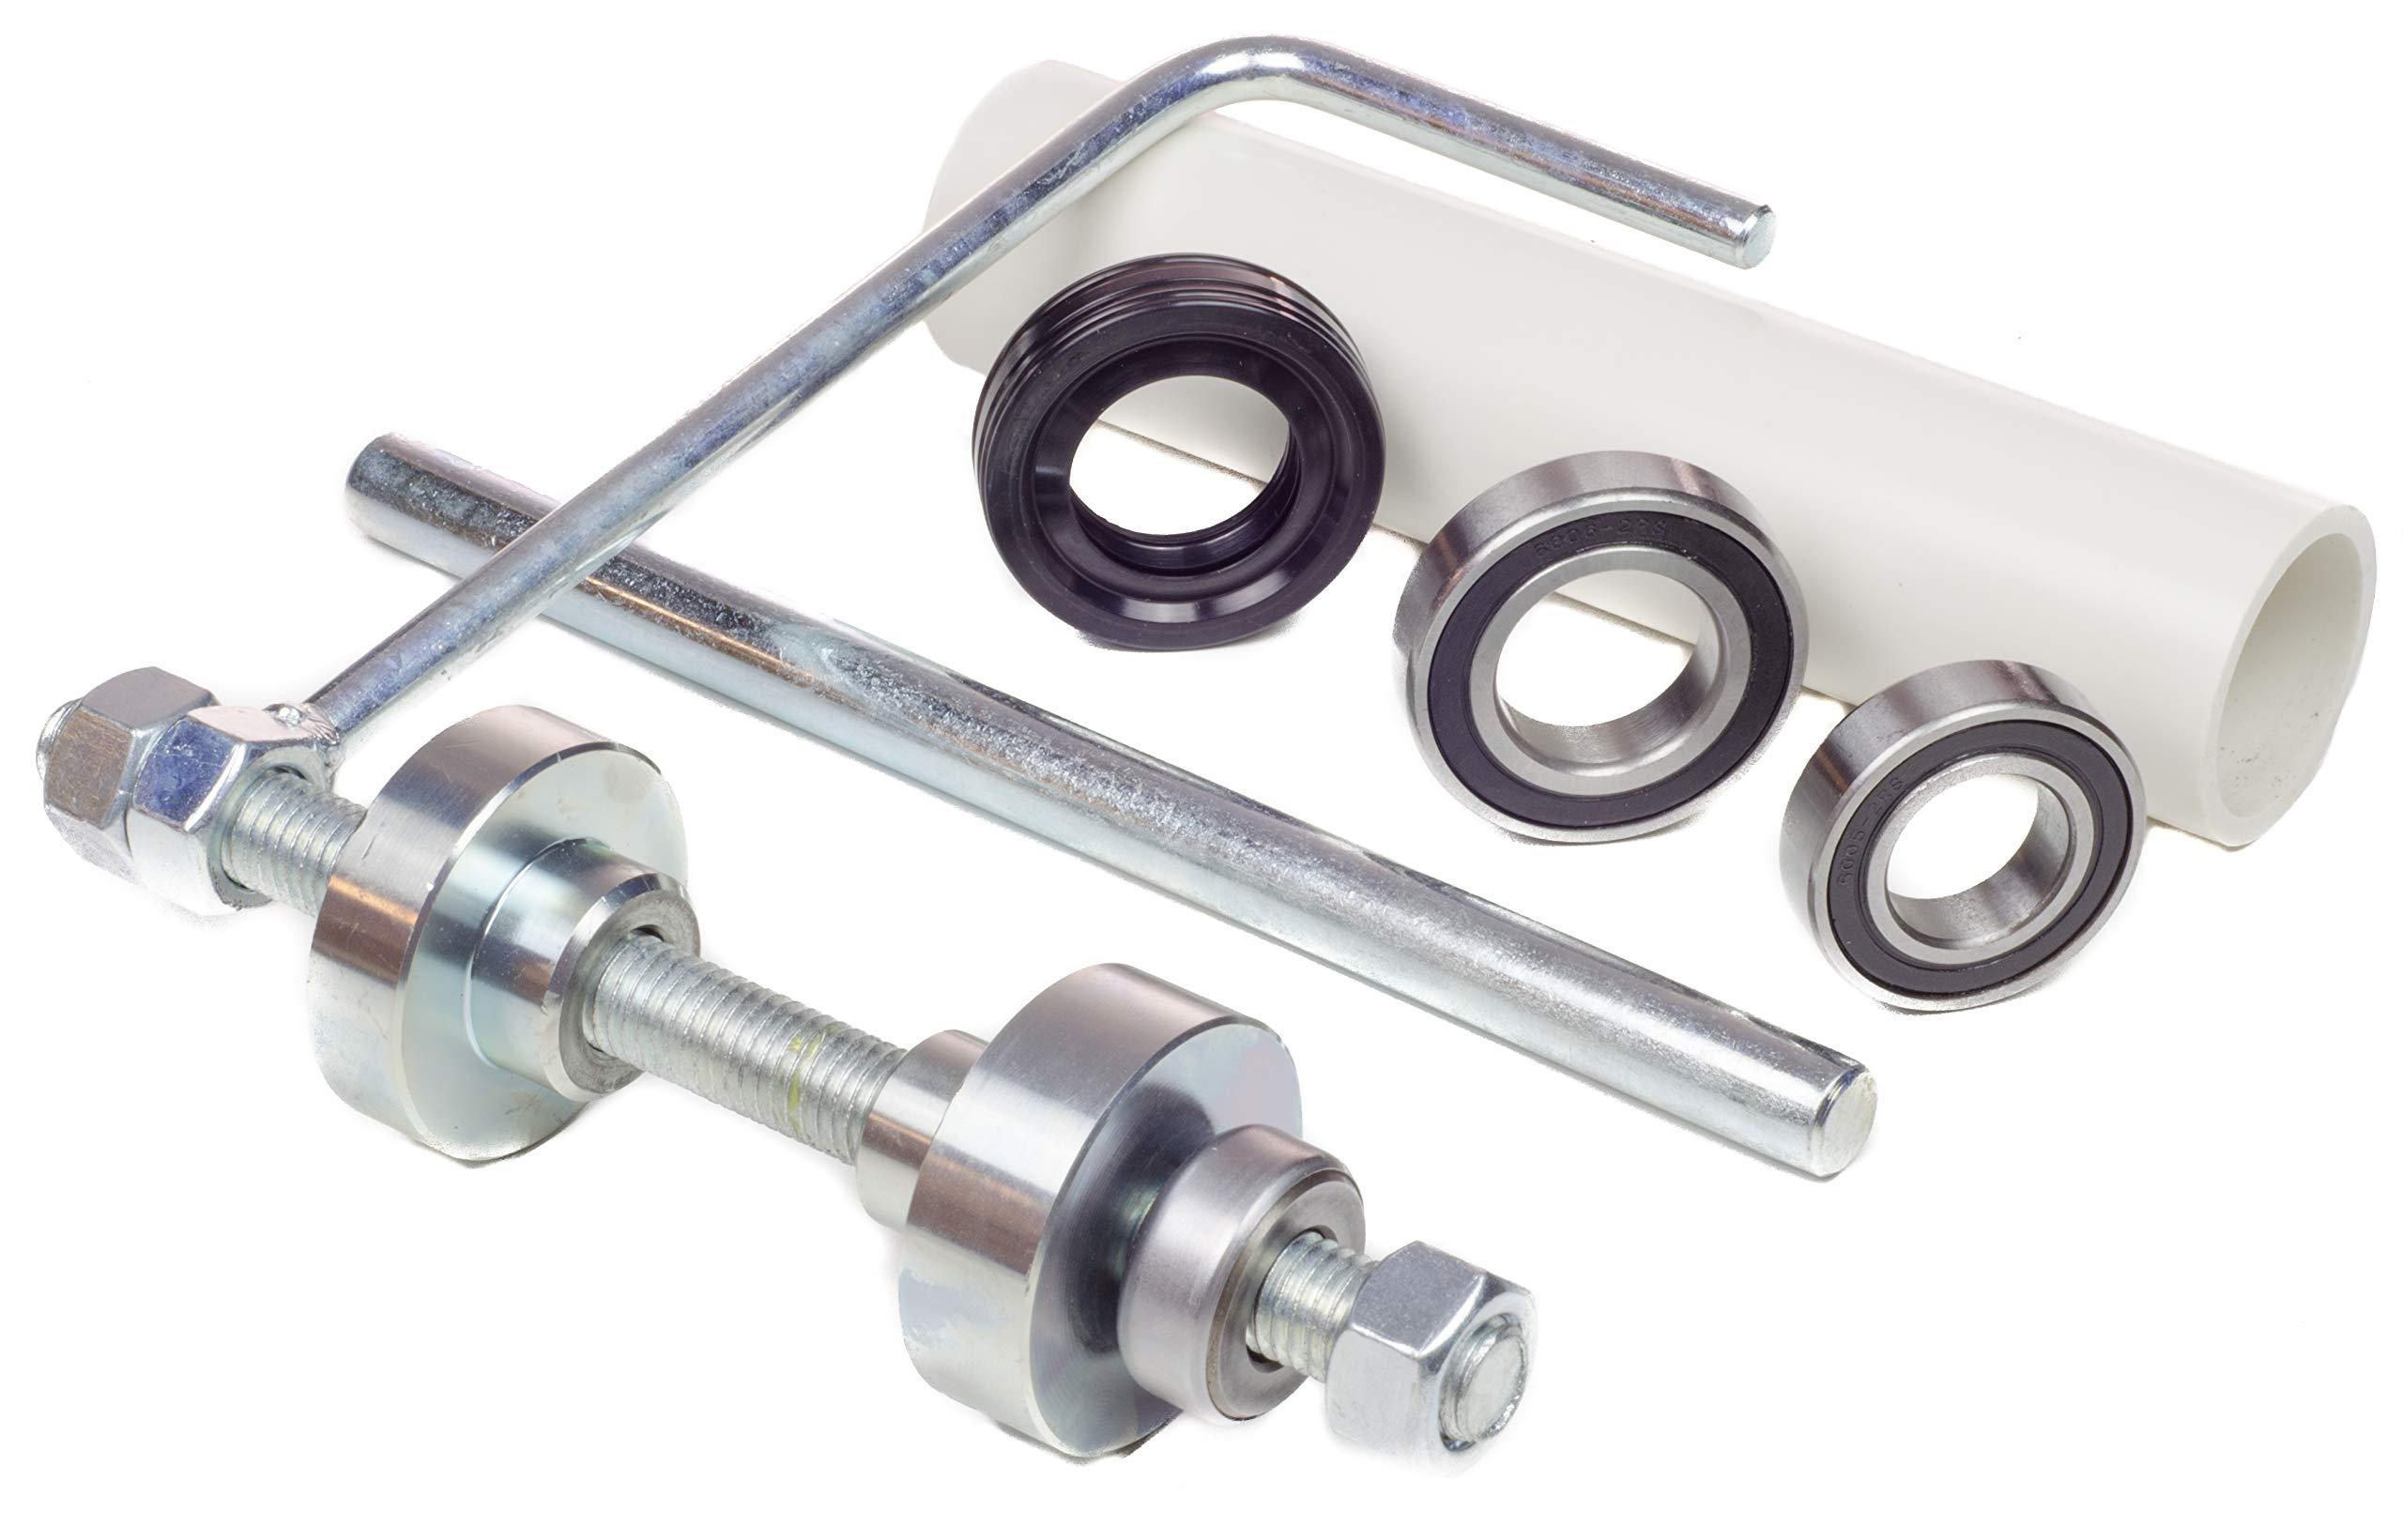 Kit King USA Whirlpool Tub Bearing Pusher Install Tool with Seal and Bearings, Bravos XL, AP5325033, W10447783, W10435302 Washing Machine Appliance Parts